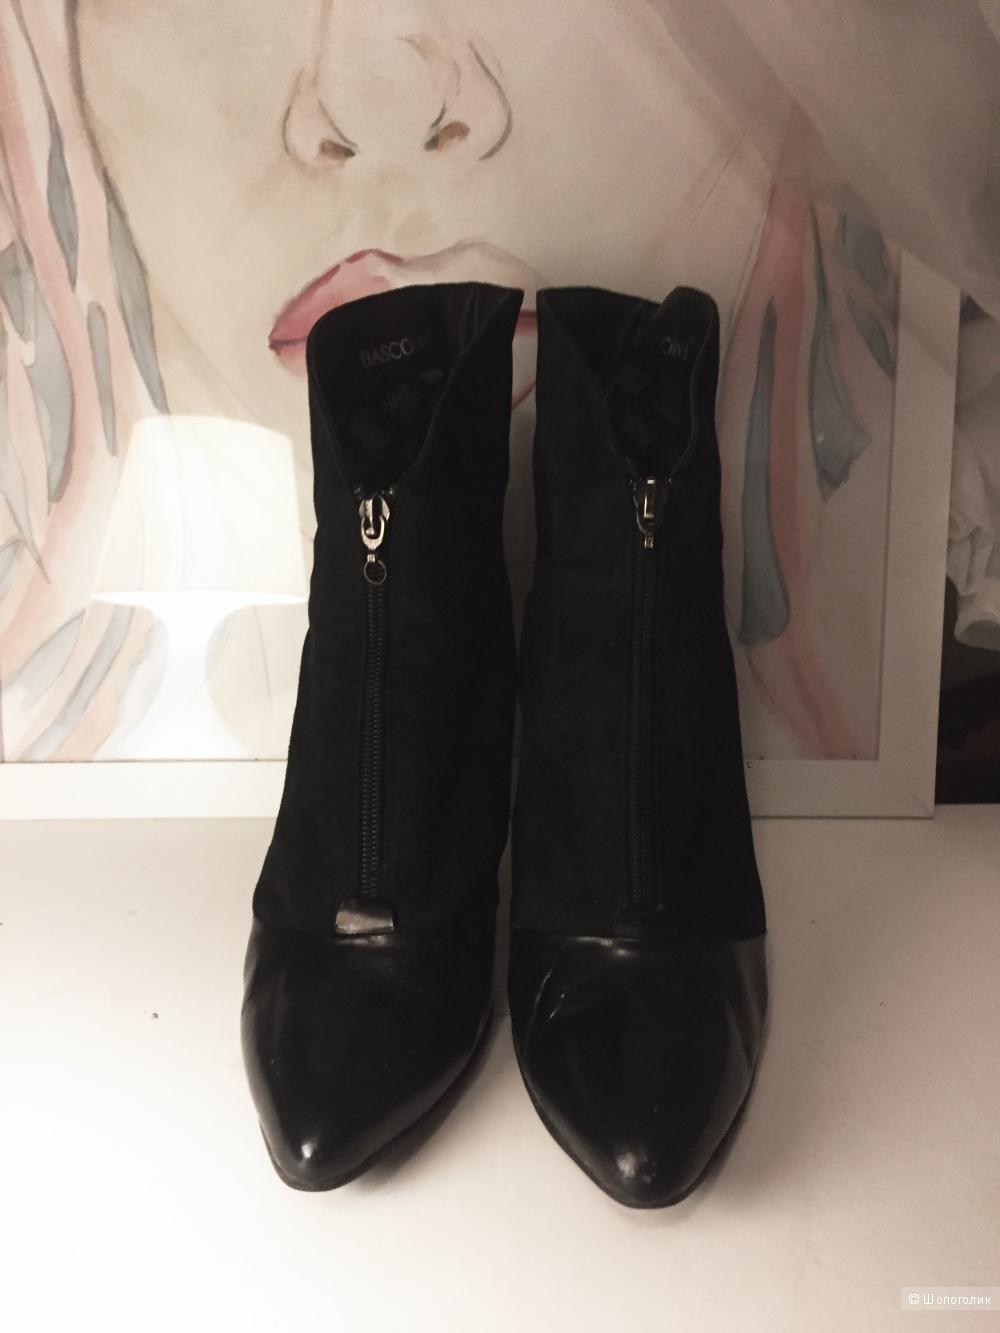 Обувь bascoi р 38-39 на байке